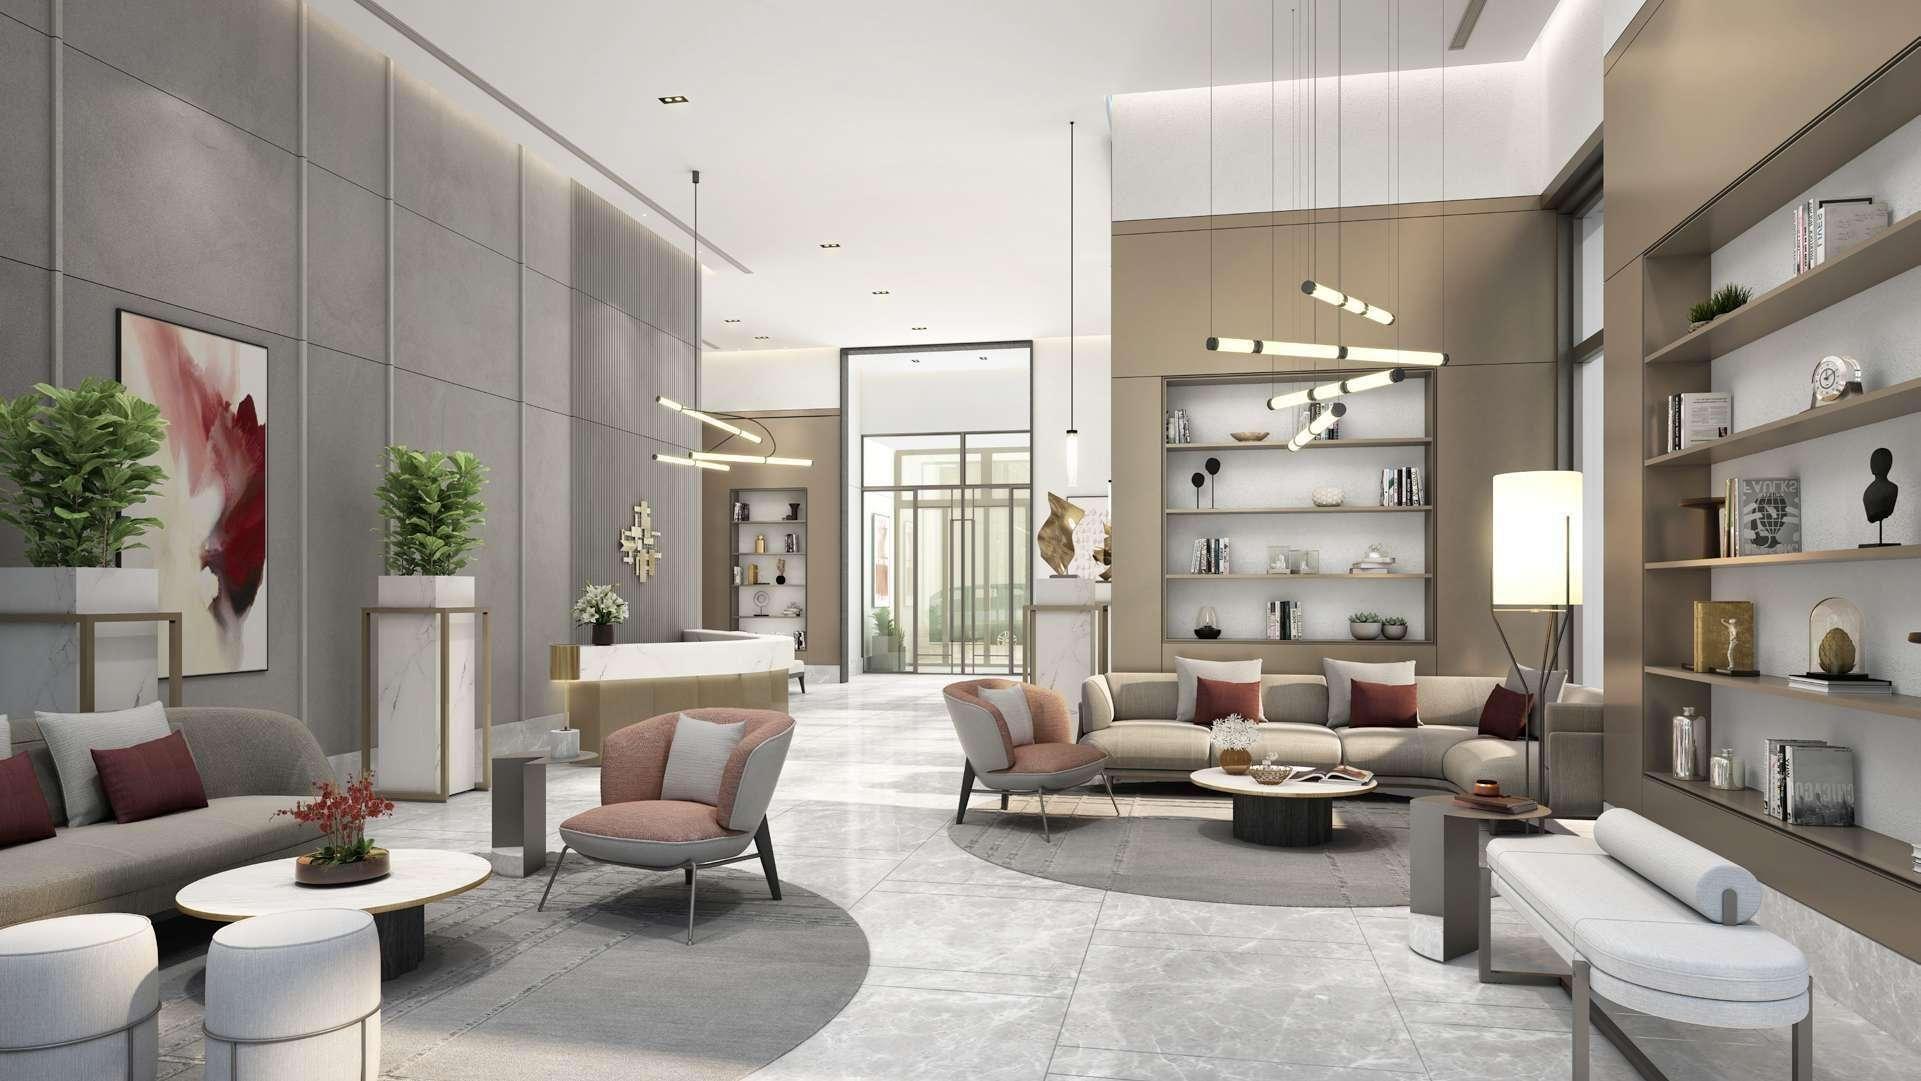 Burj Crown Luxusapartments (1-Bedroom)